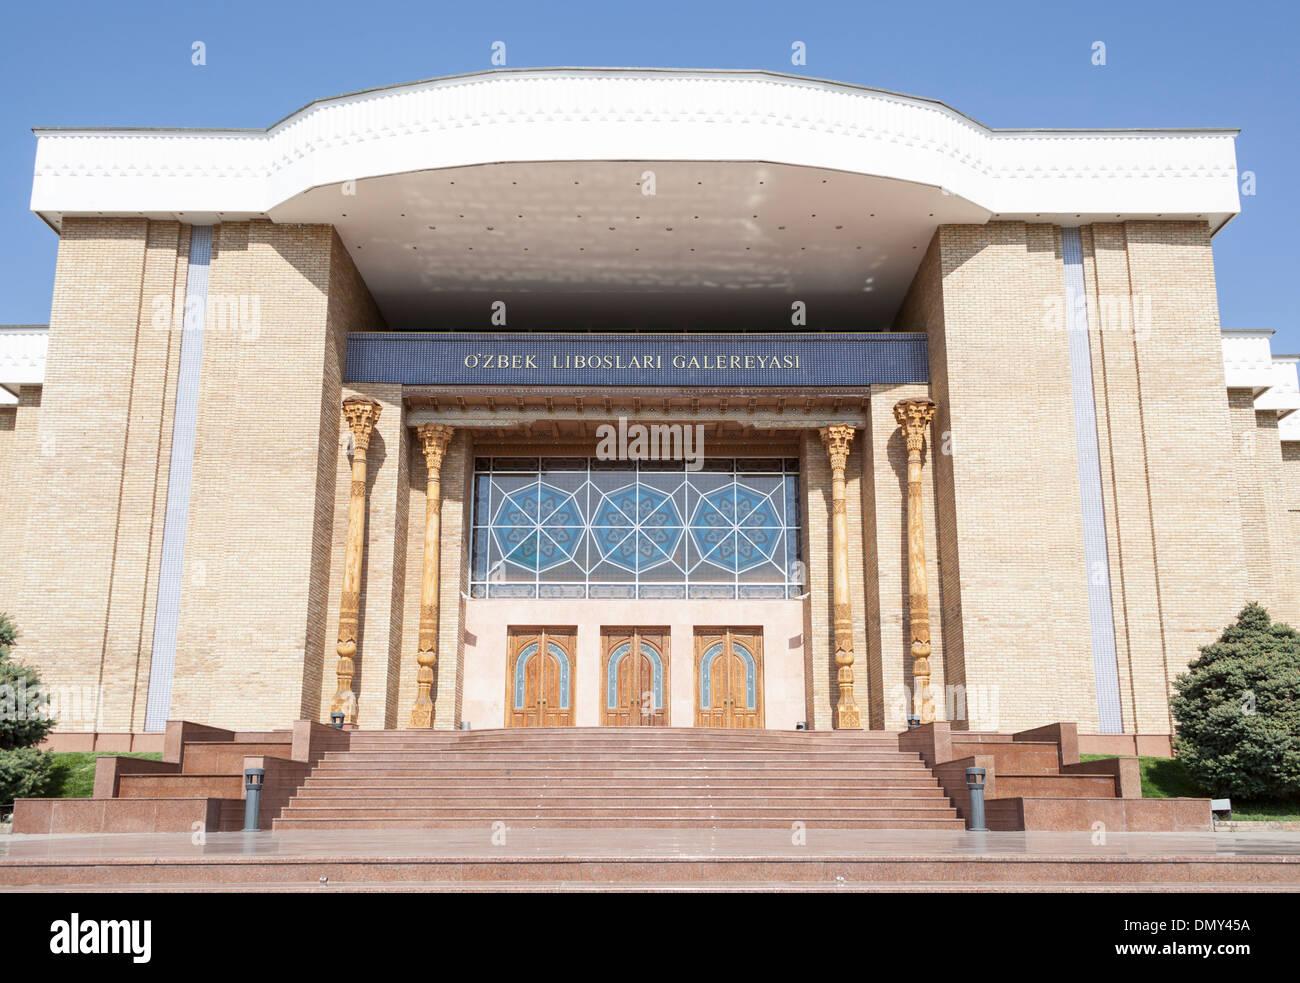 National Arts Centre, Ozbek Liboslari Galereyasi, Tashkent, Uzbekistan - Stock Image